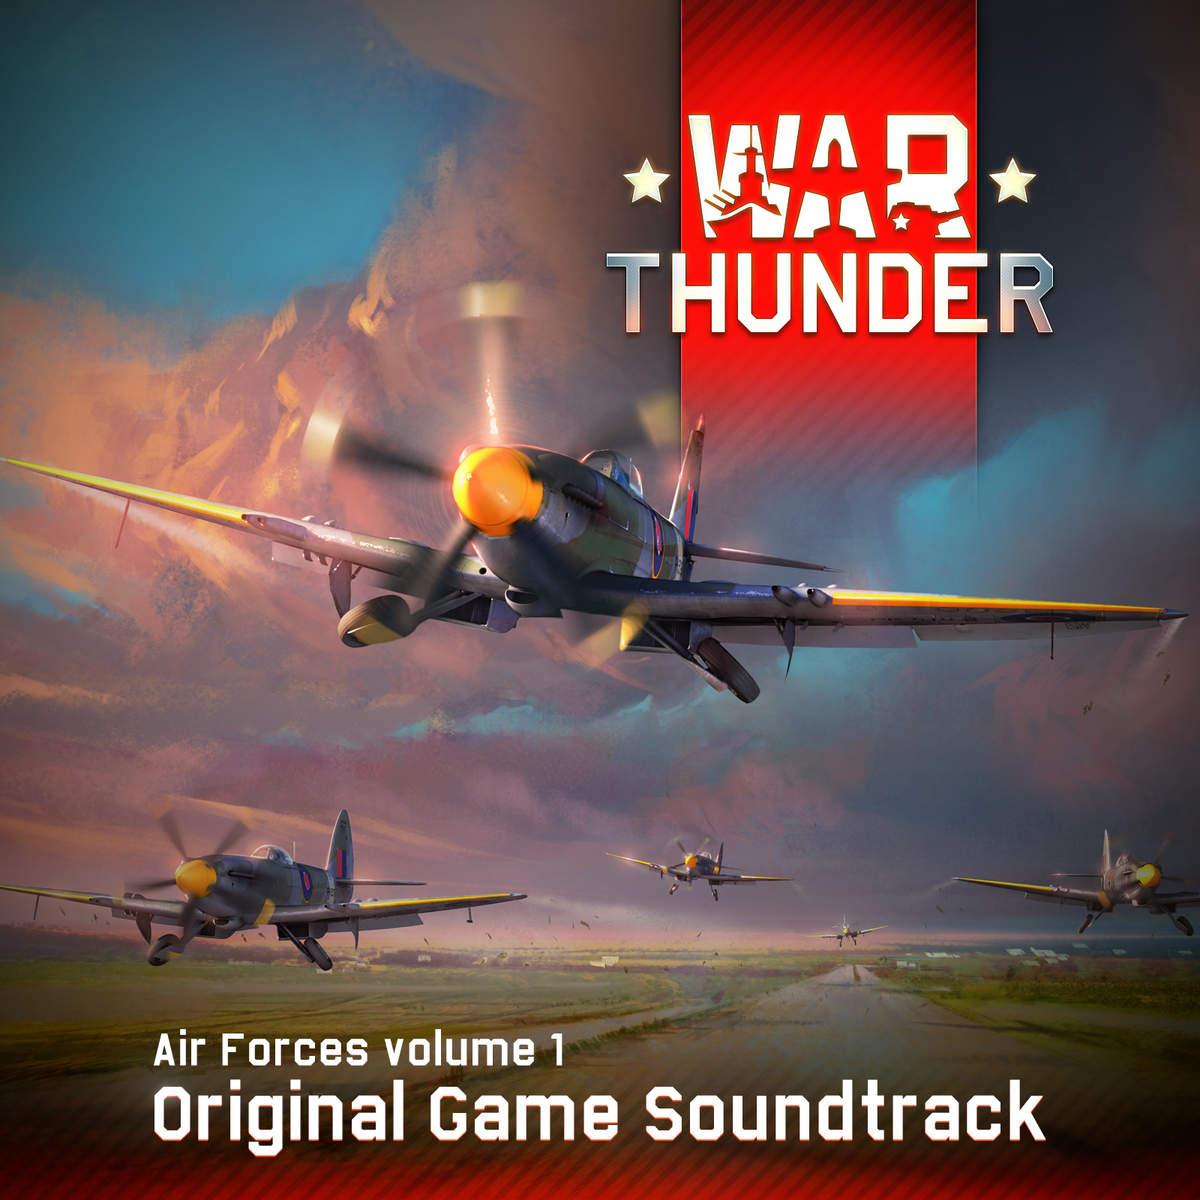 War_Thunder_Original_Game_Soundtrack-Air_Forces_volume_1_cover1200x1200.jpg